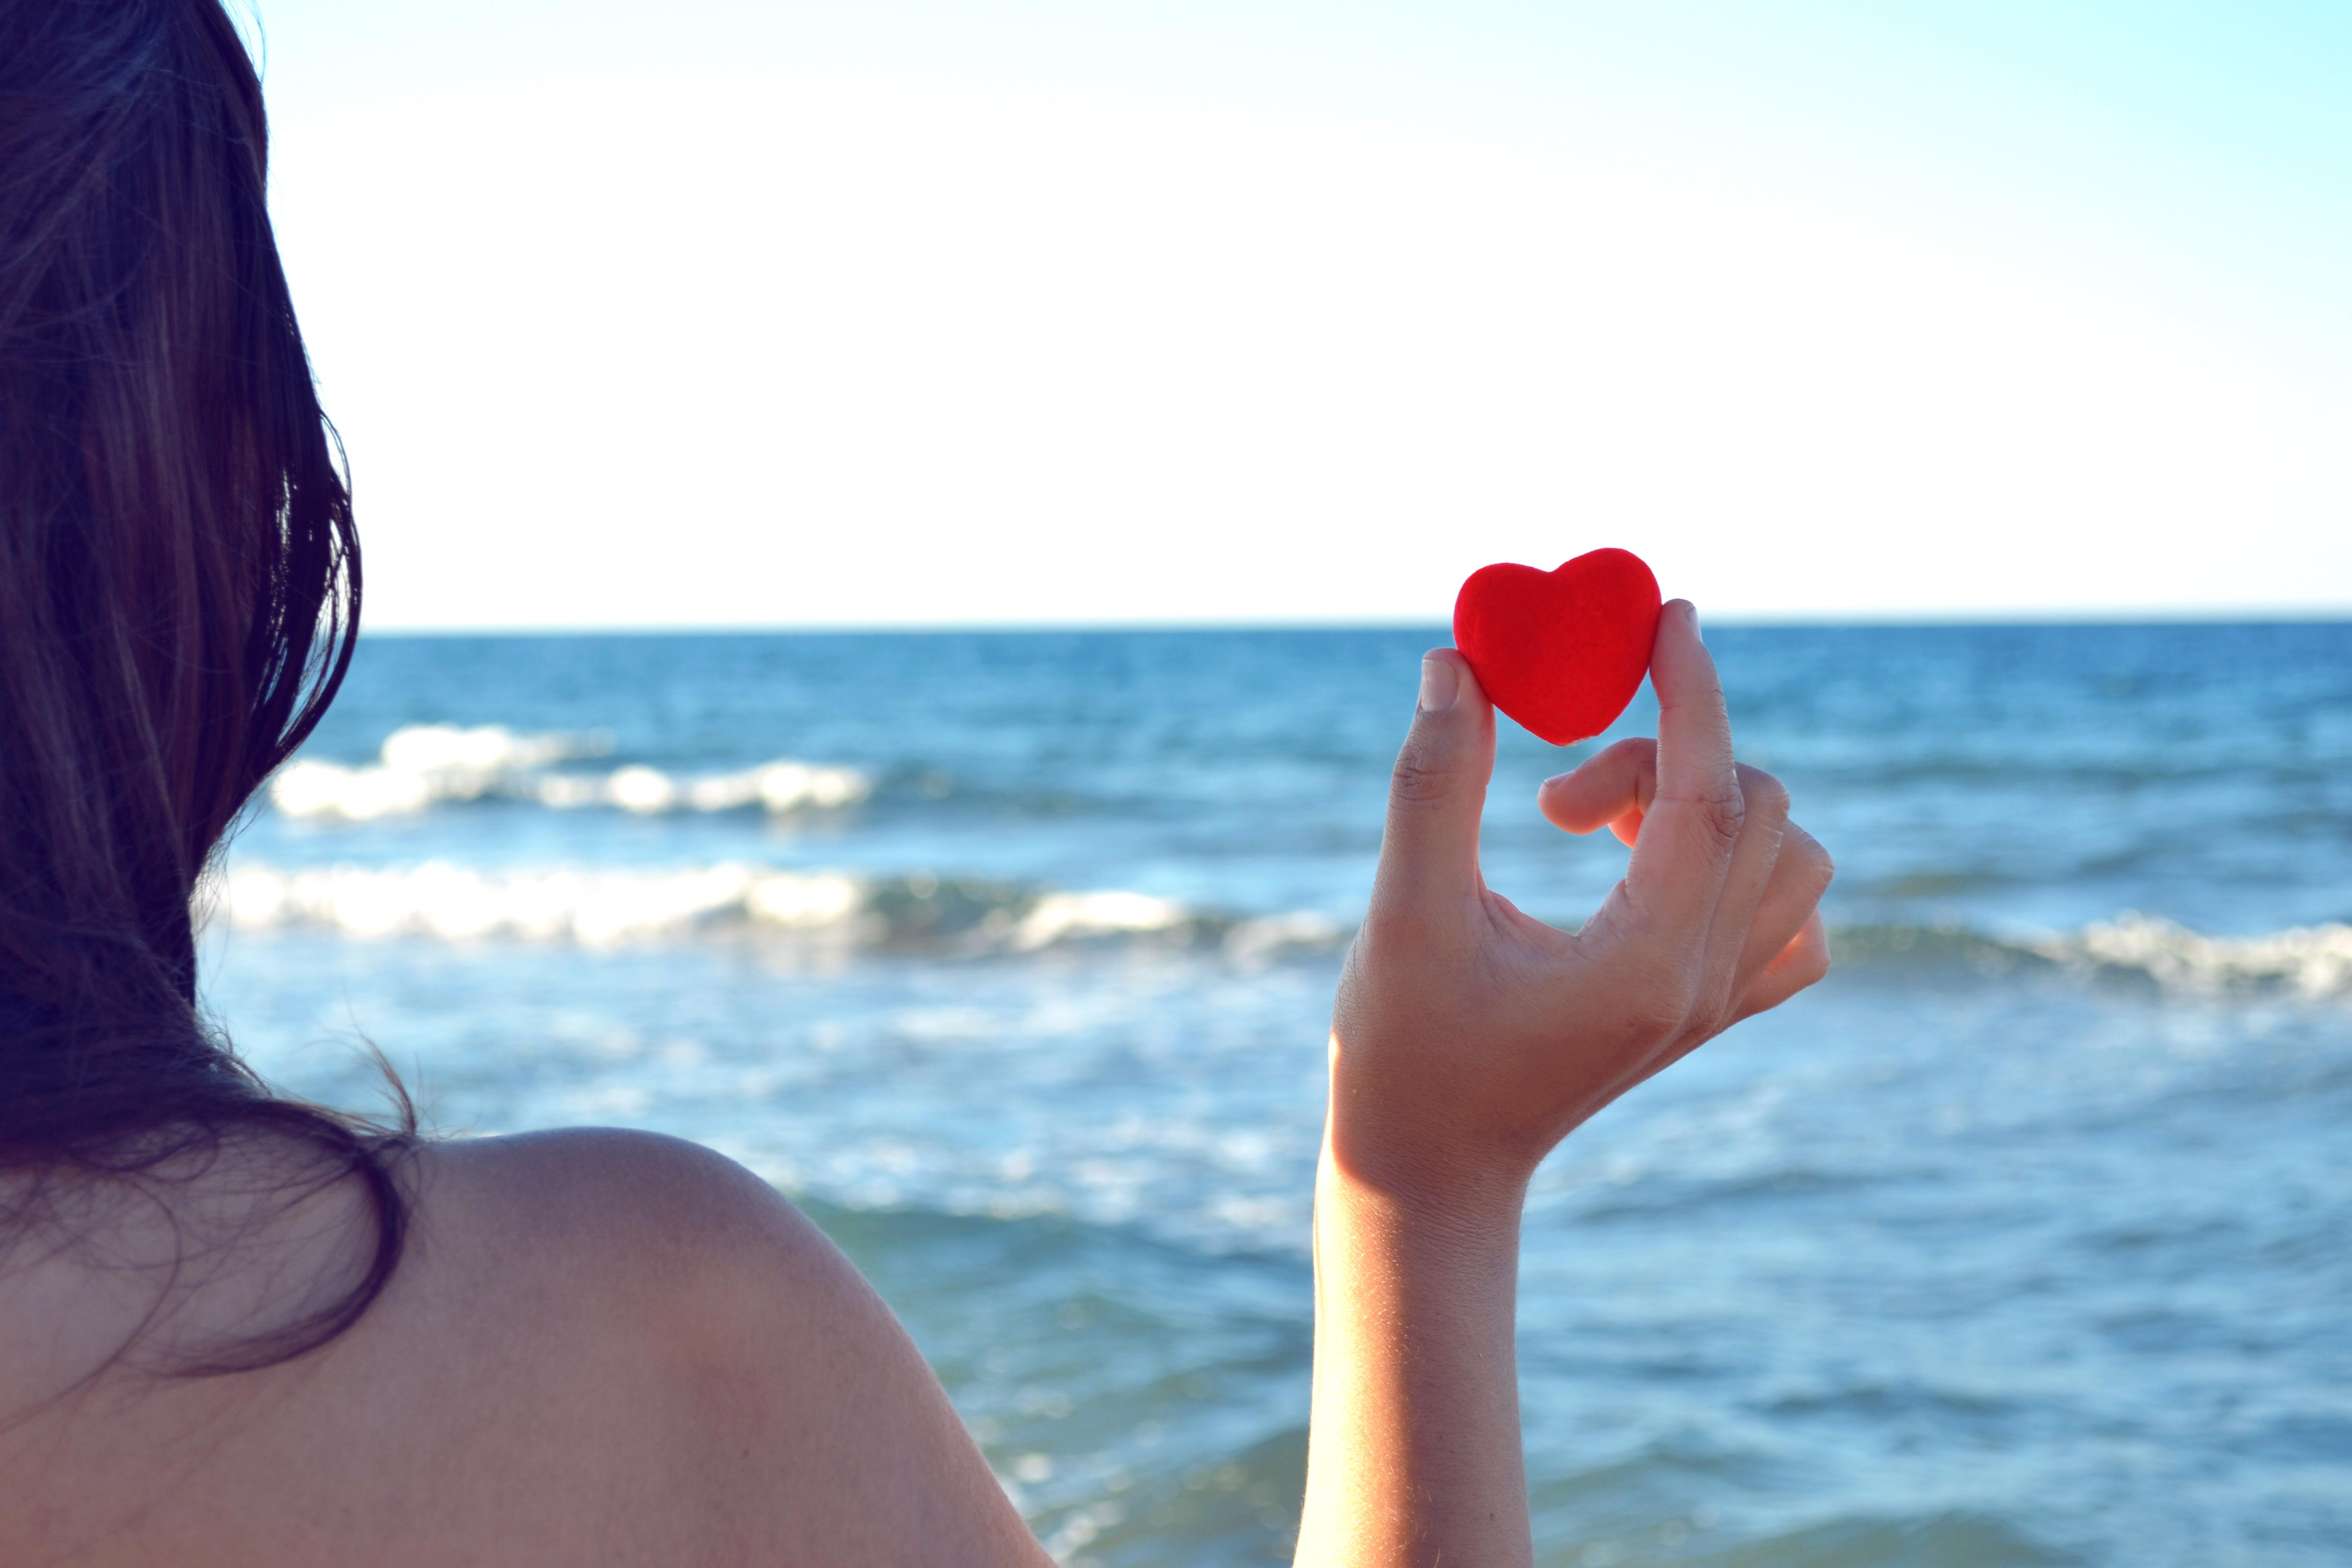 stockvault-heart-shape152297